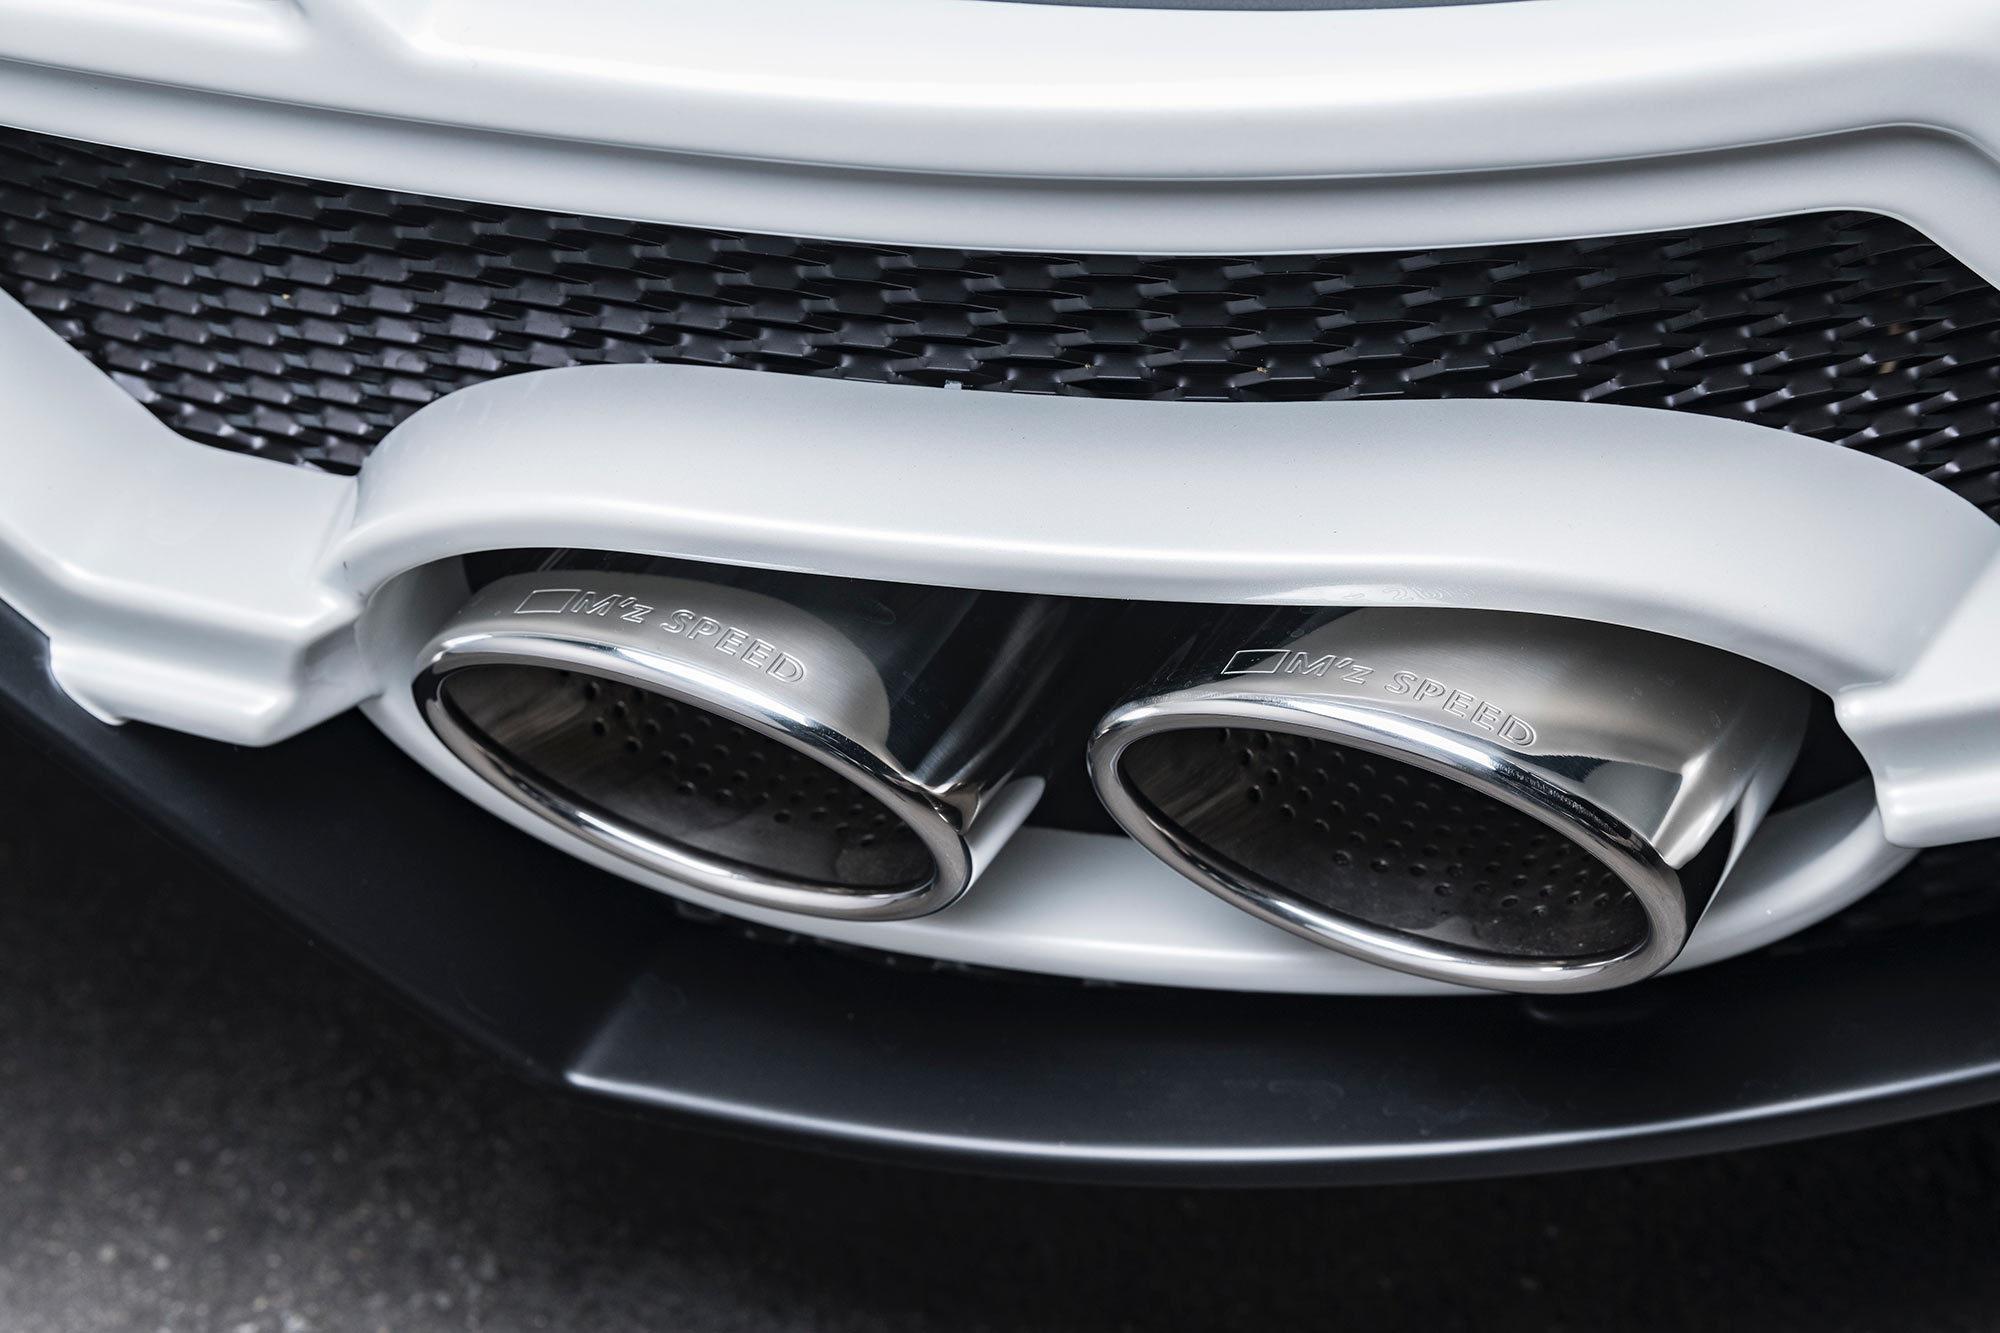 M'z Speed body kit for Toyota C-HR latest model